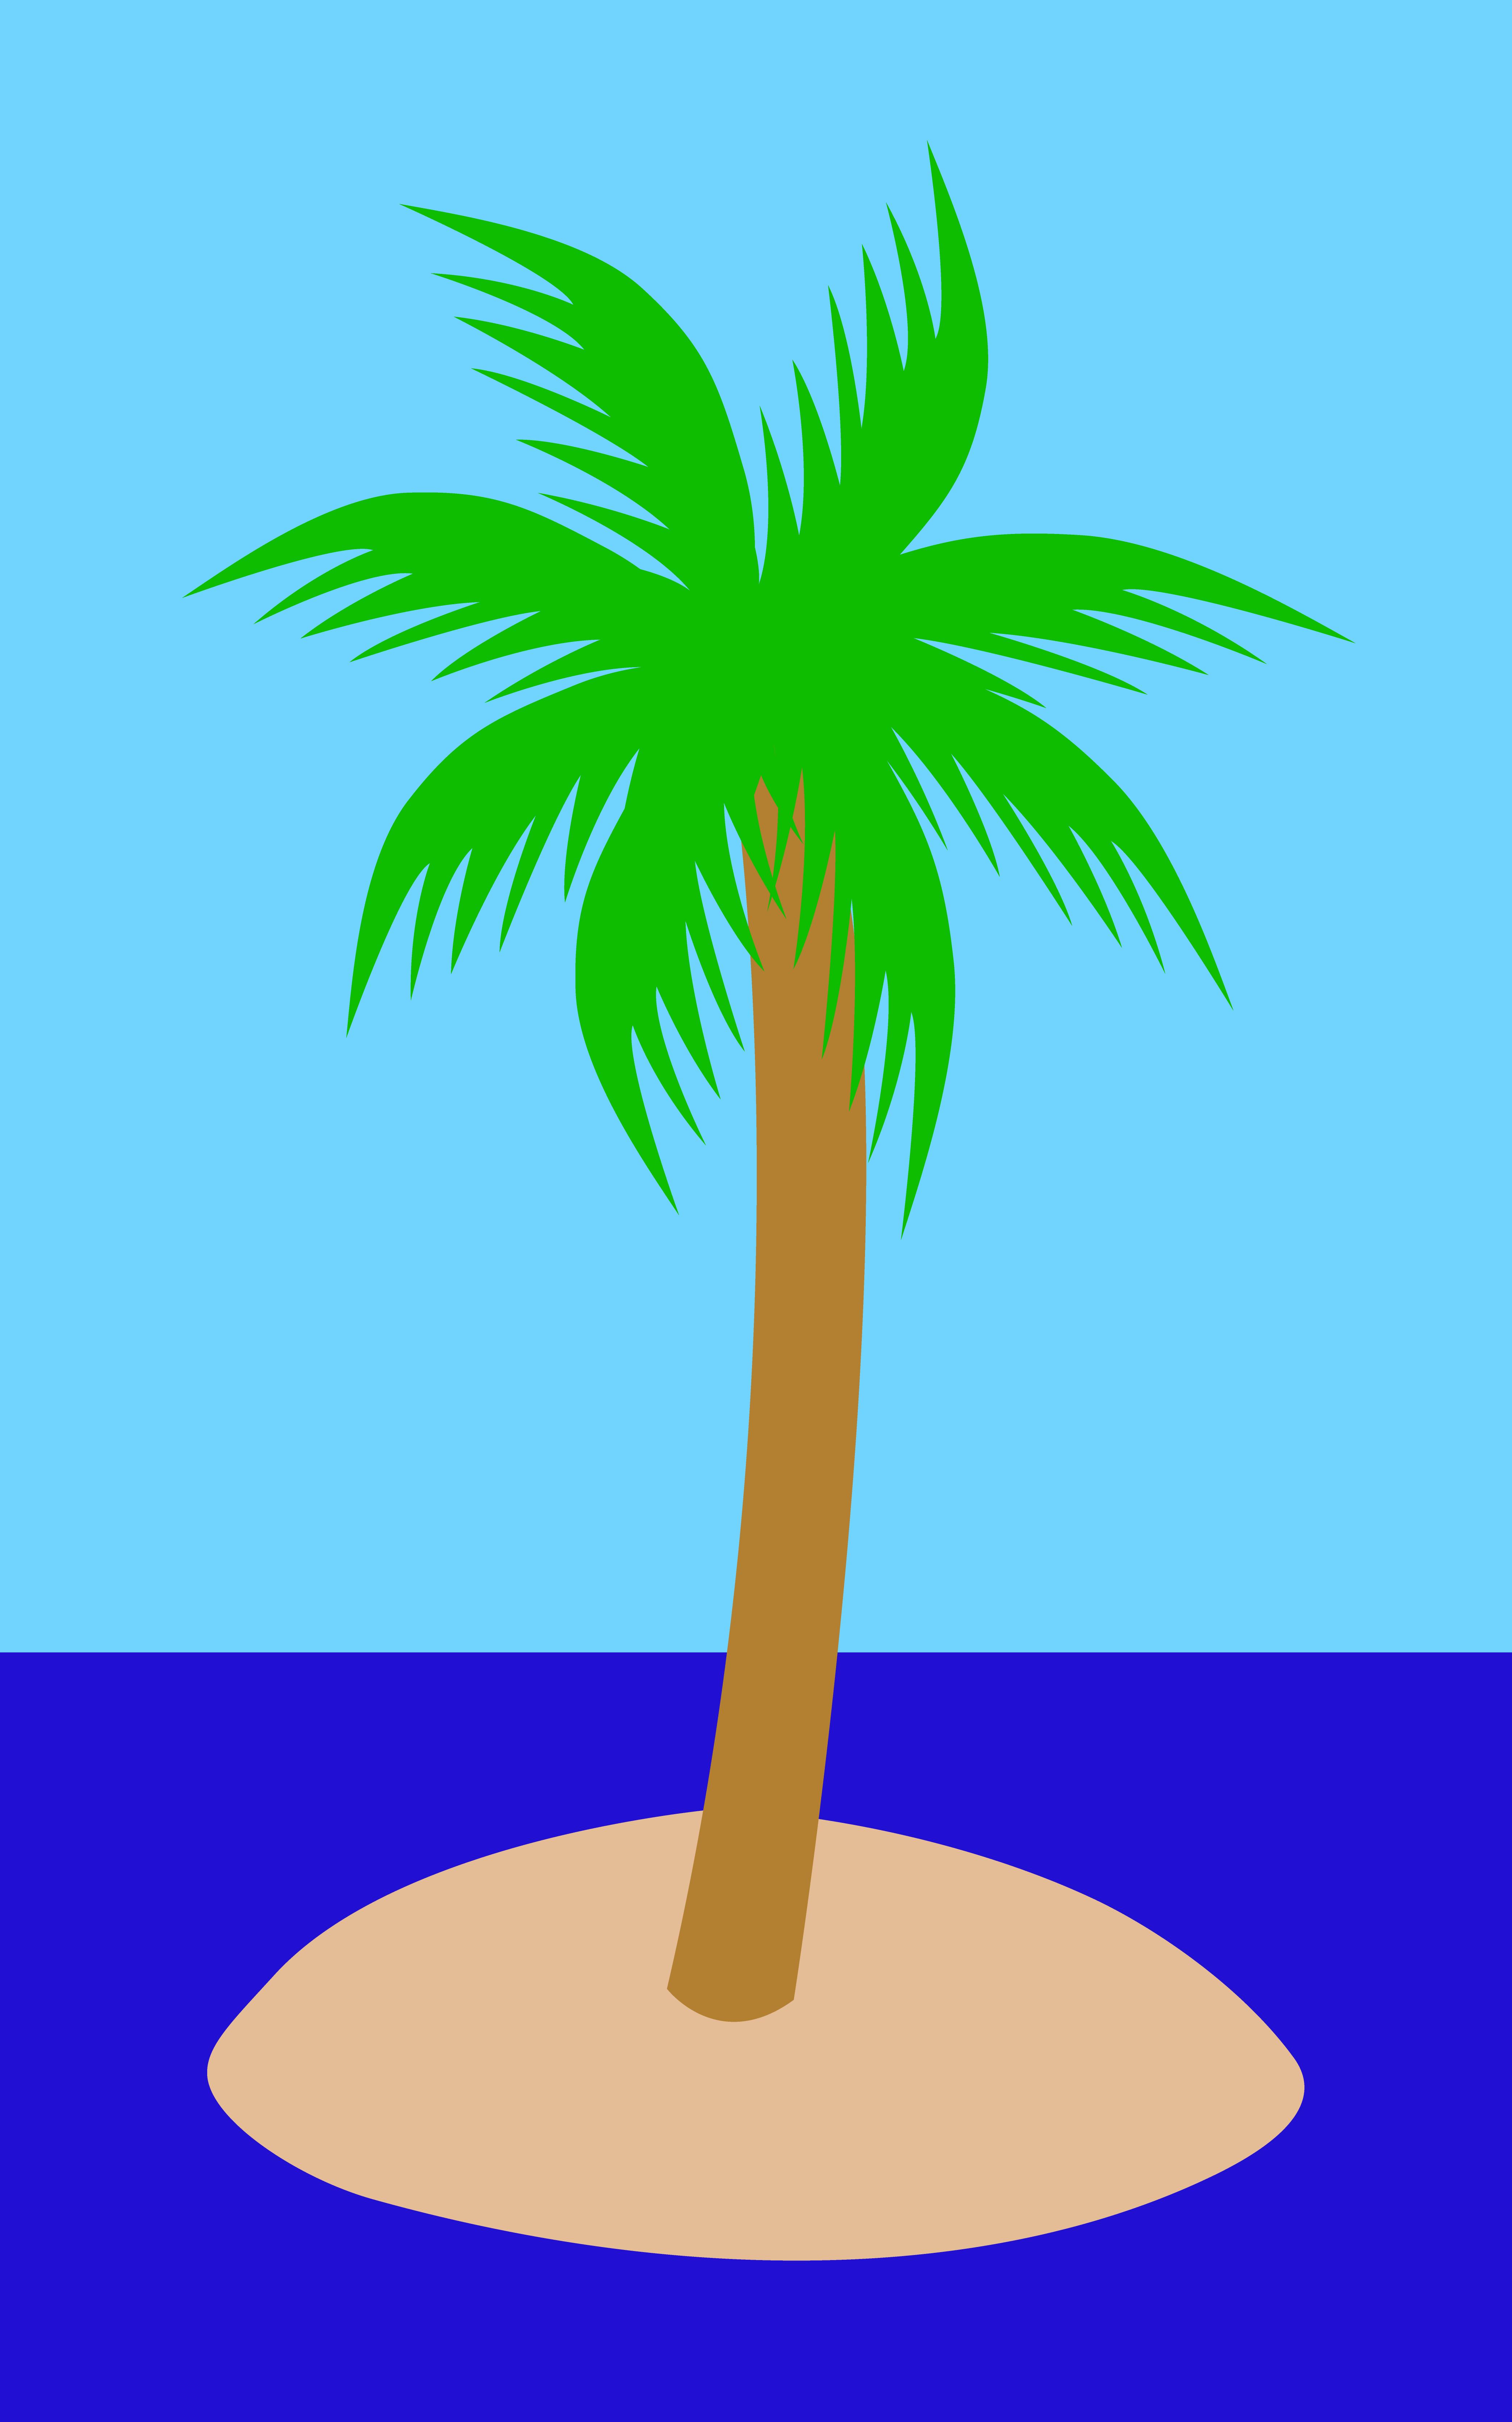 Ocean clipart palm tree On Tree Island Island Tree